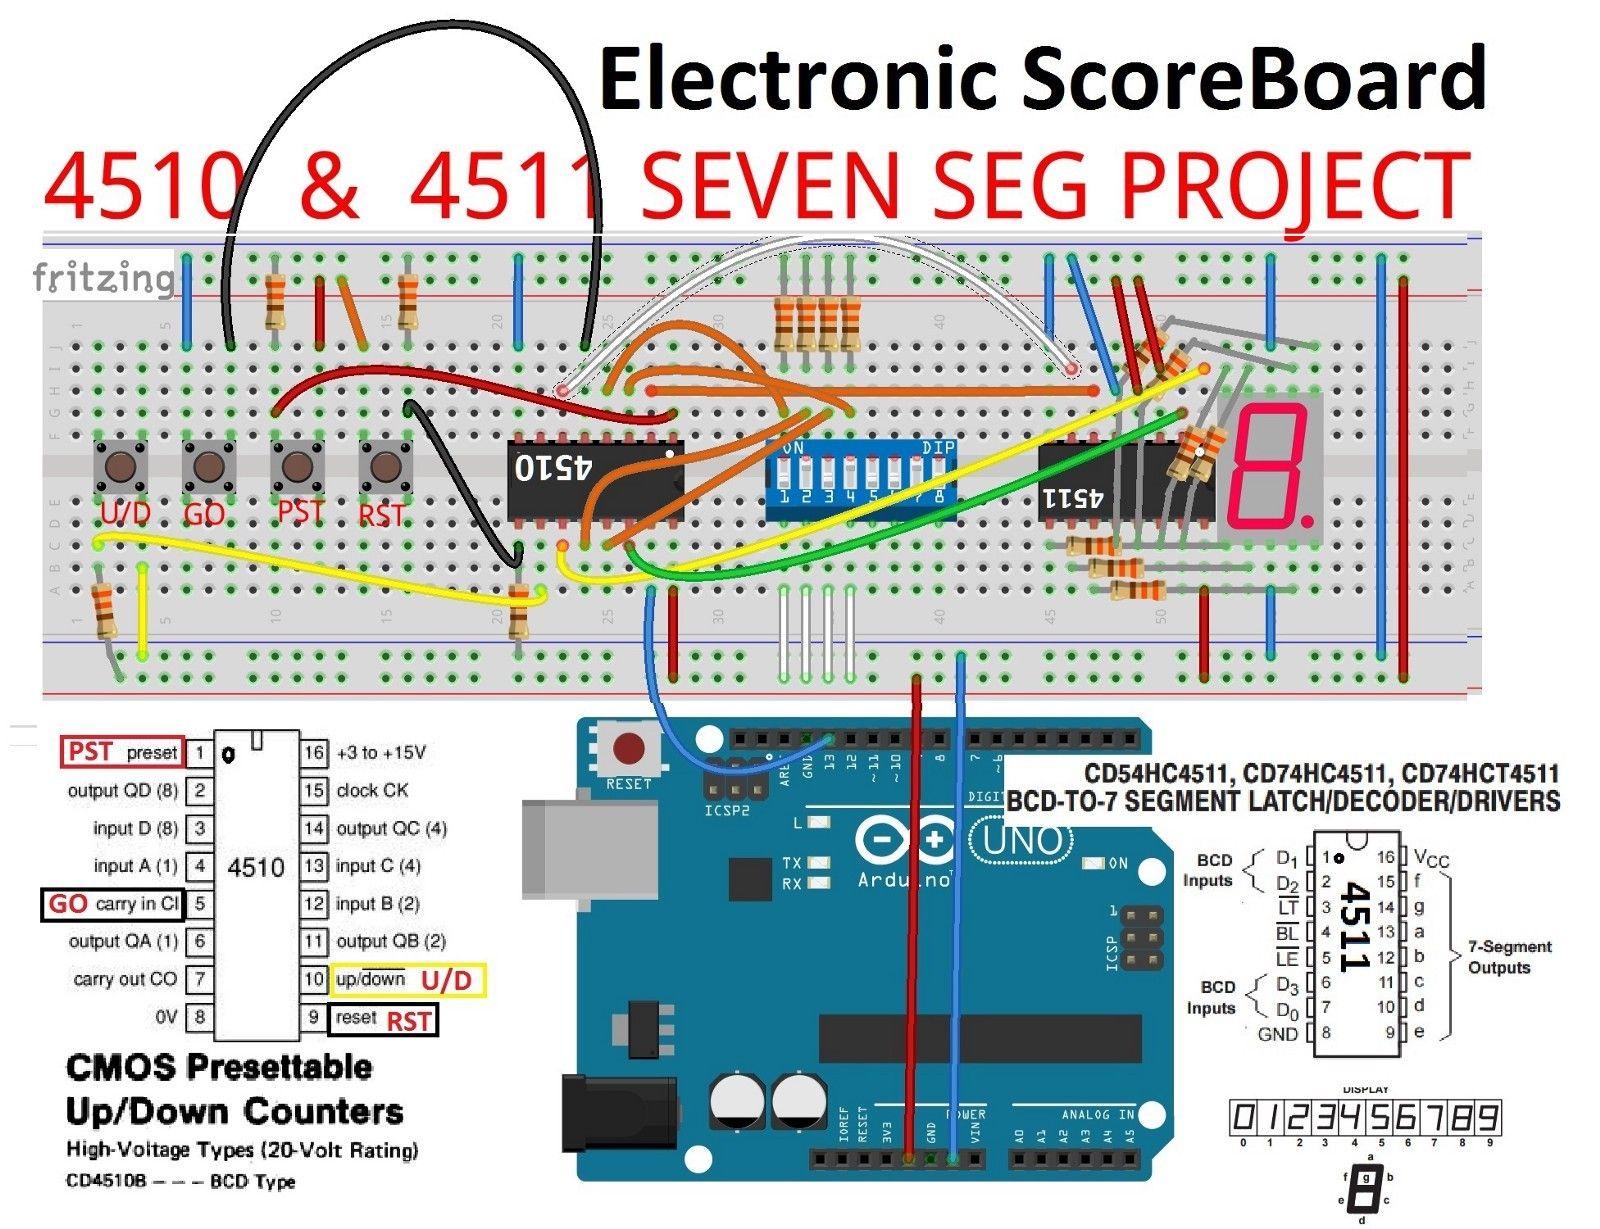 Scoreboard Circuit Diagram In 2020 Circuit Diagram Scoreboard Circuit